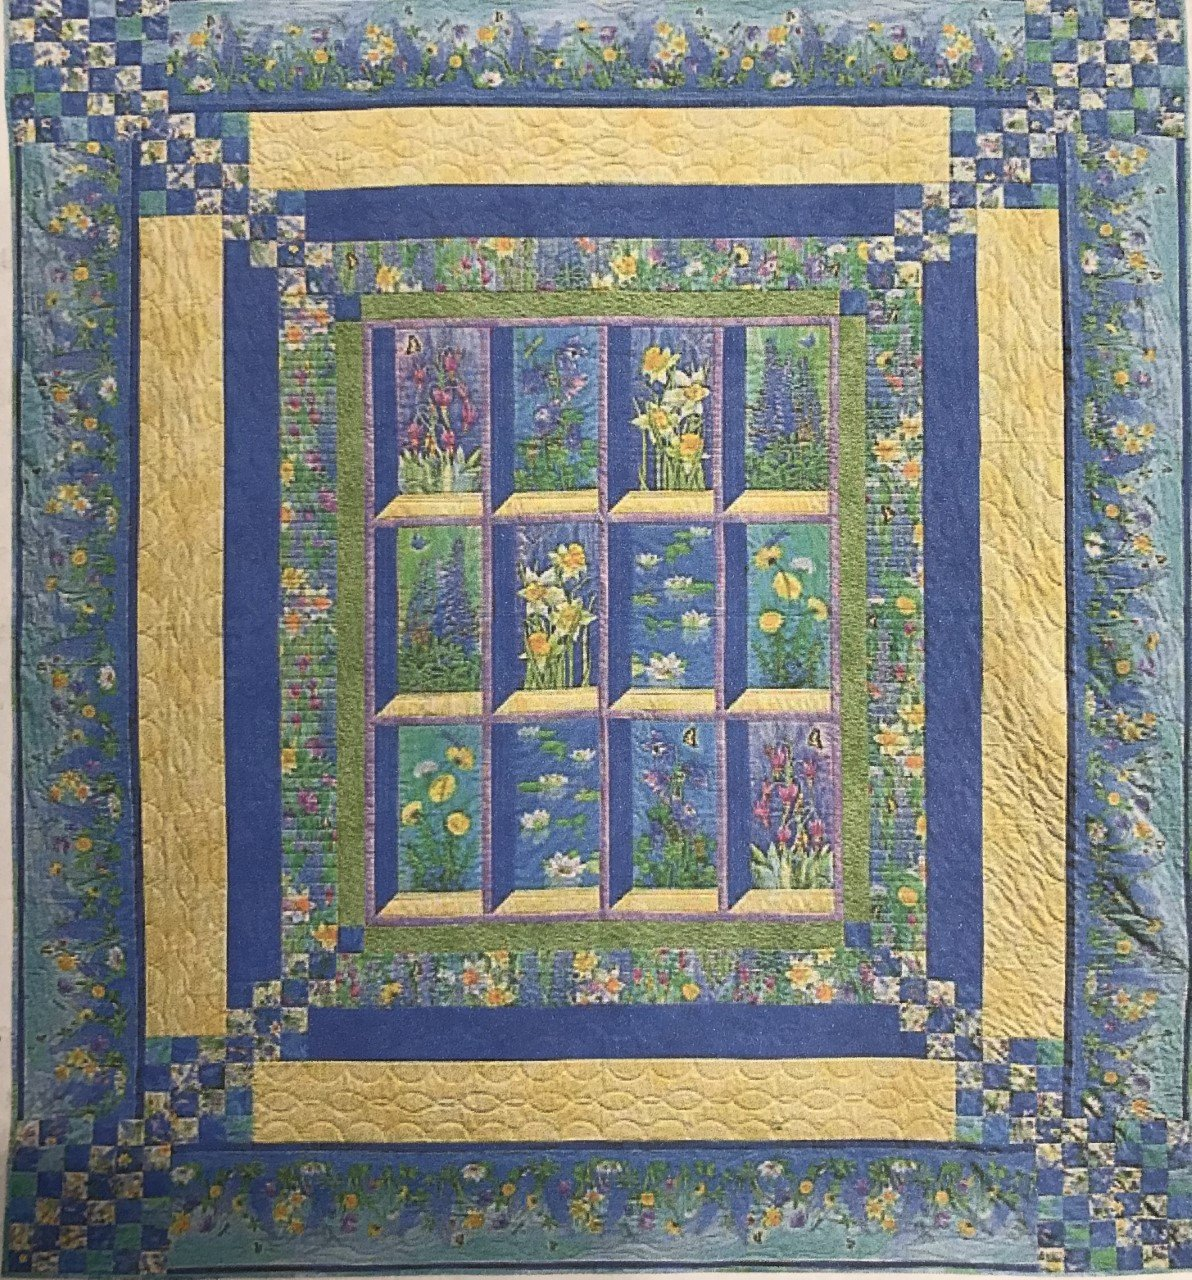 Nature's Garden Quilt Kit